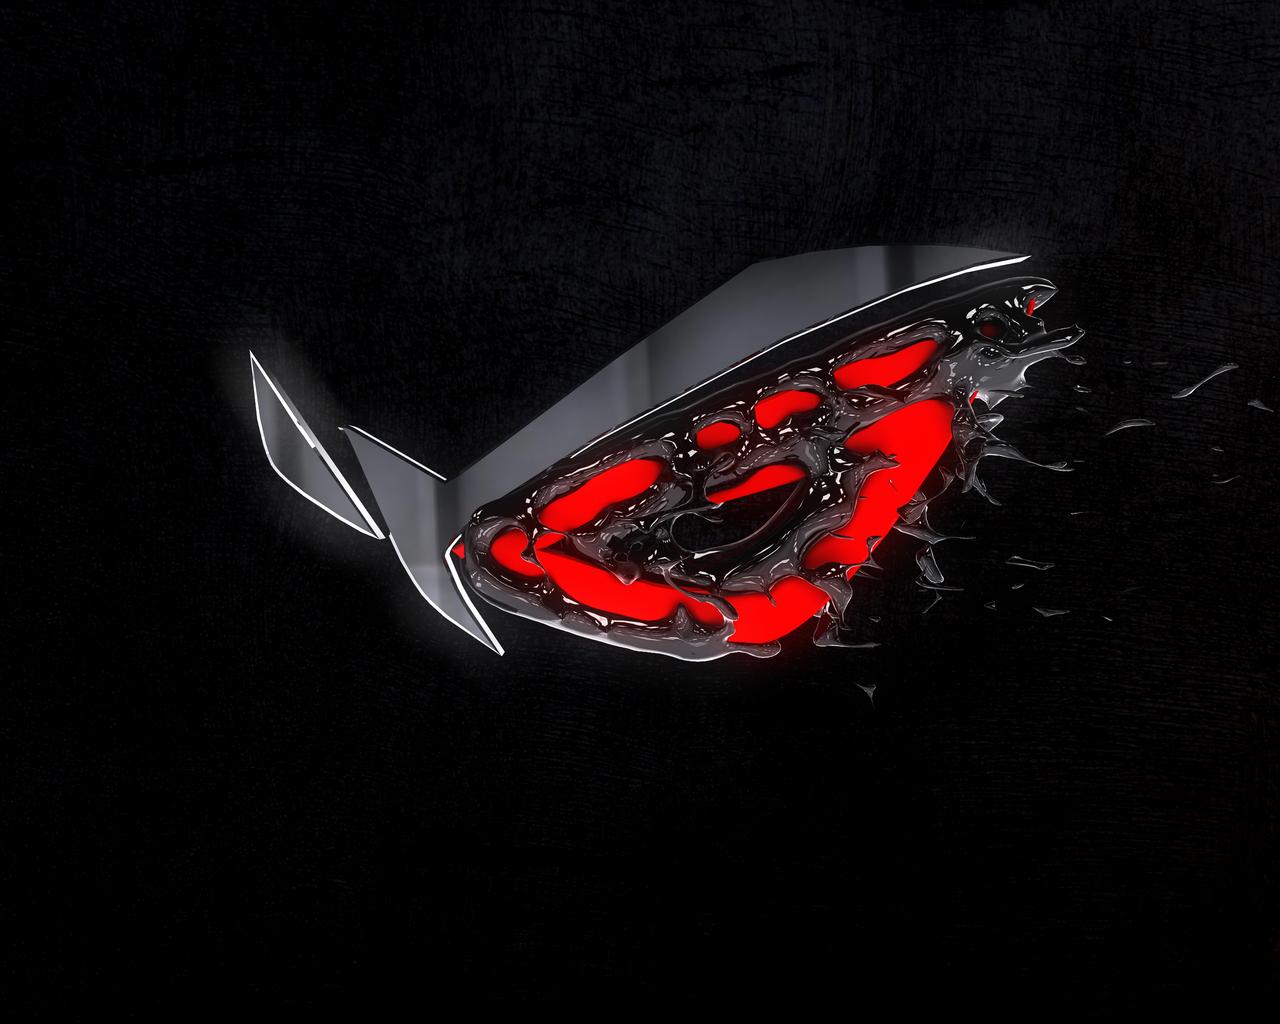 republic-of-gamers-3d-logo-4k-oe.jpg